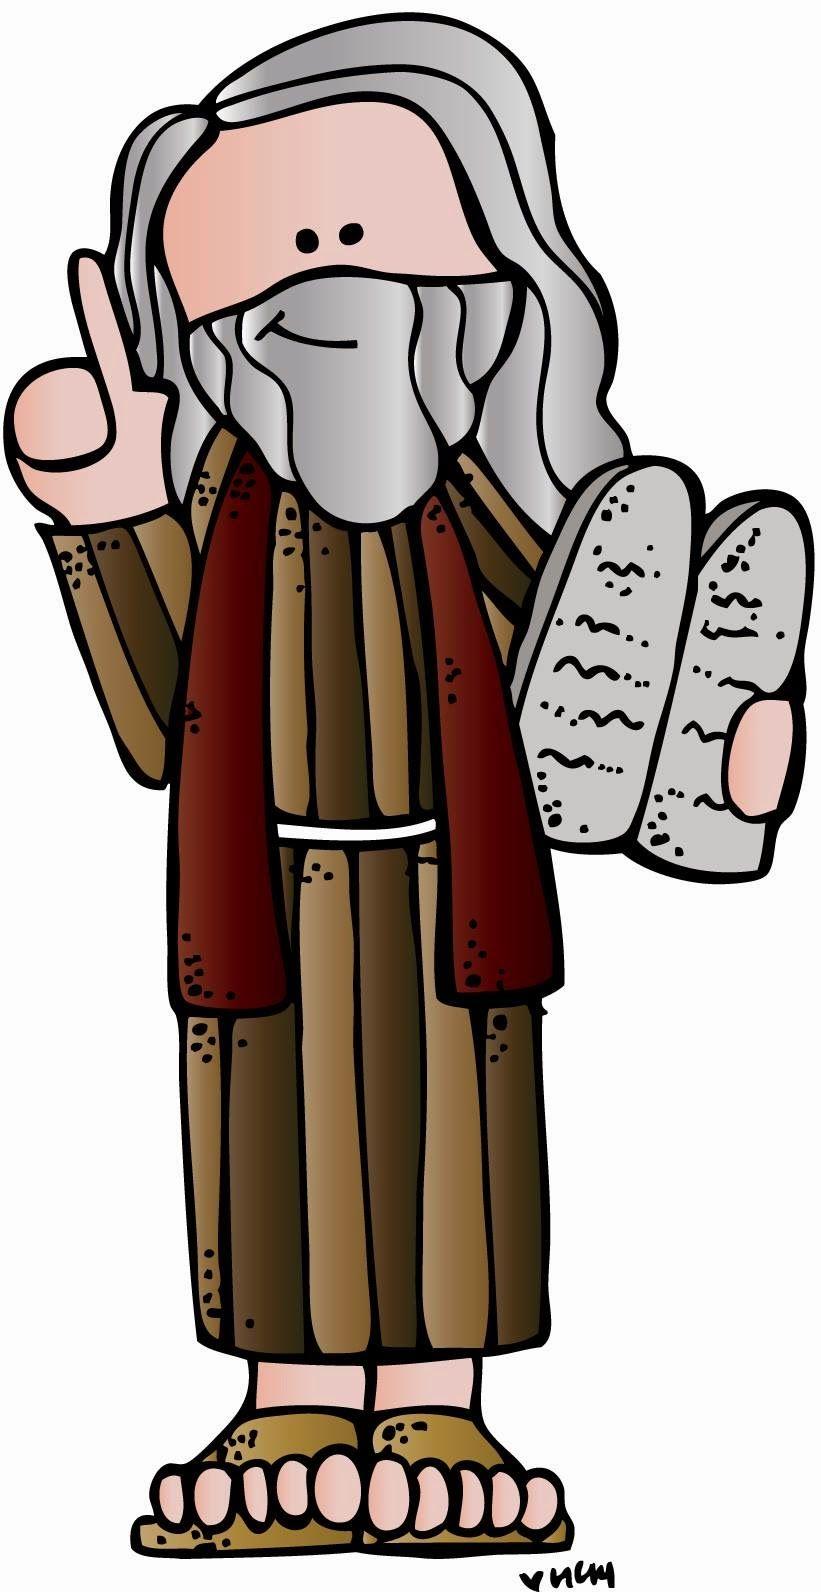 una aventura 3d aventuras en el desierto mois s nacimientos rh pinterest ca bible character clipart for palm sunday bible characters clip art free